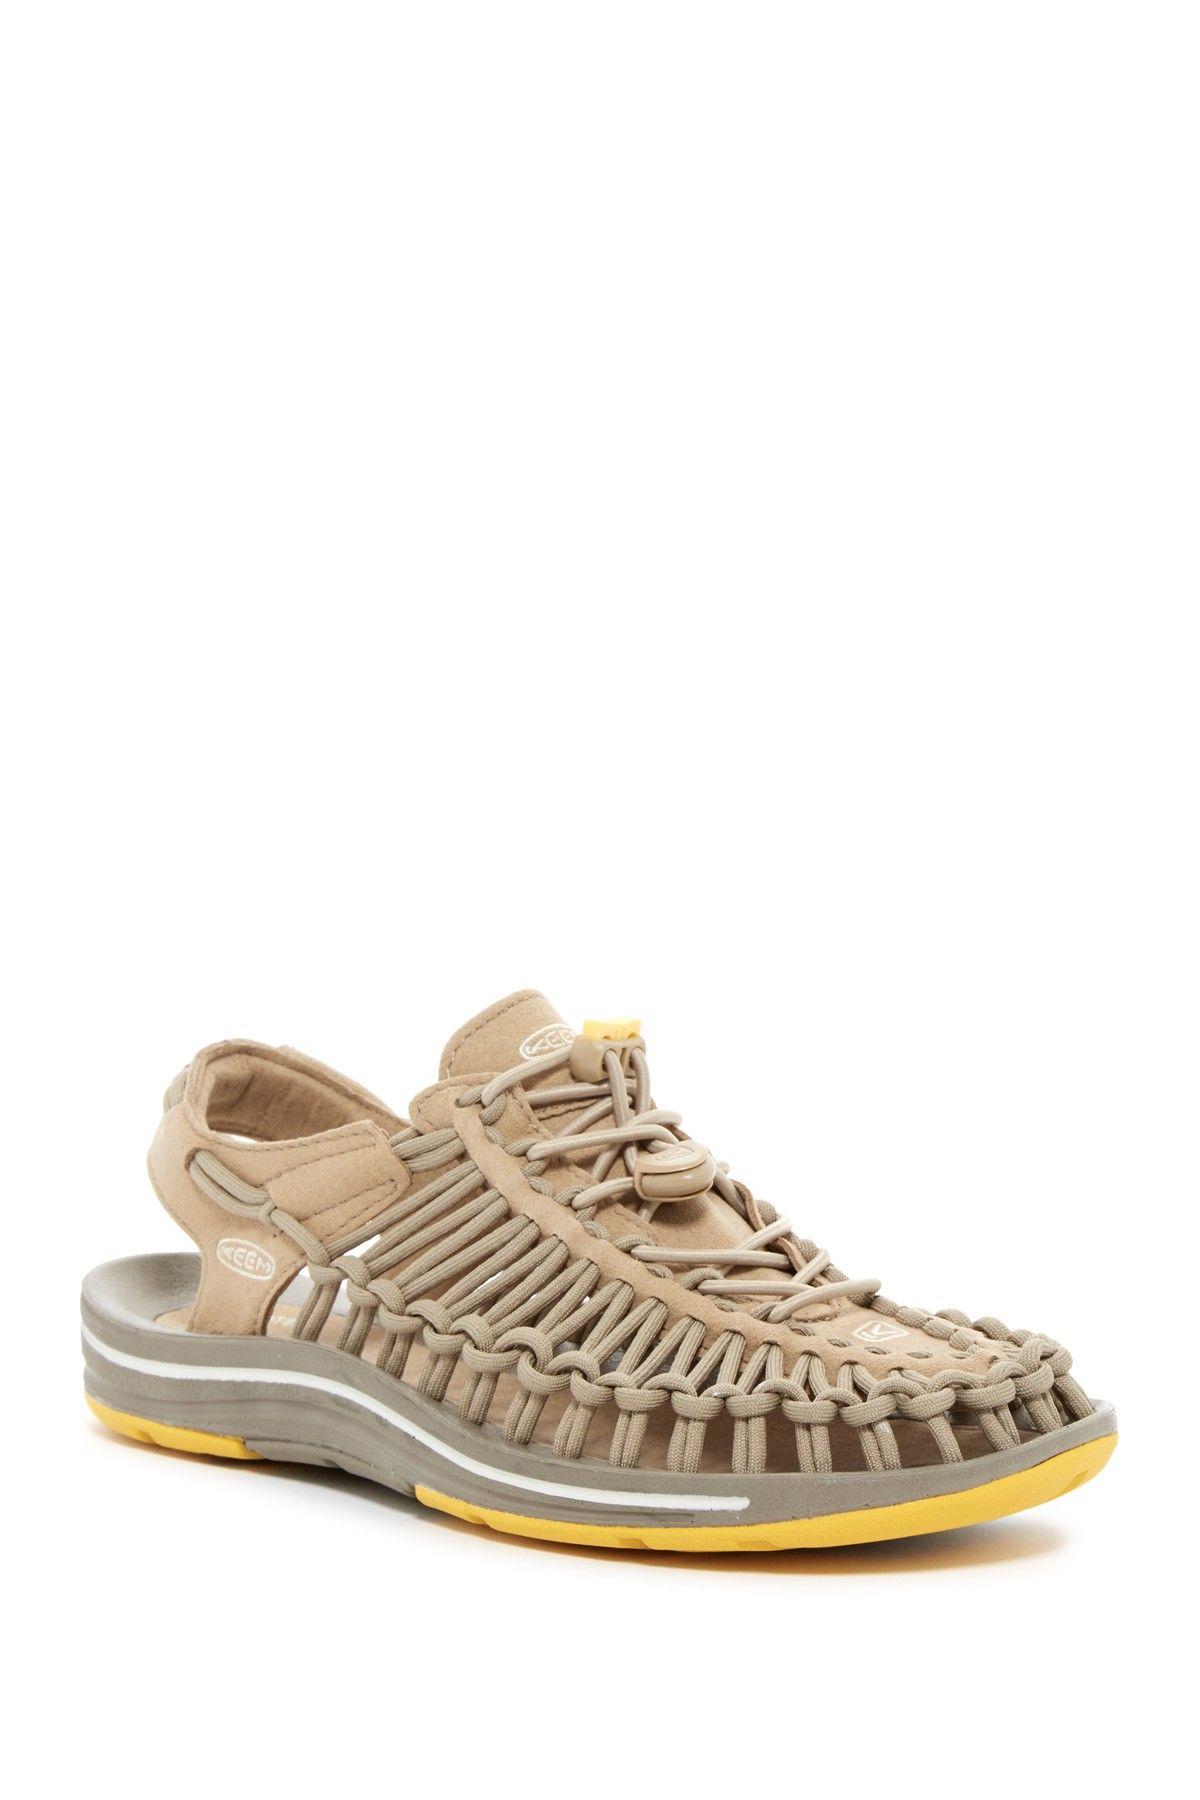 Uneek 3C Woven Cord Sandal